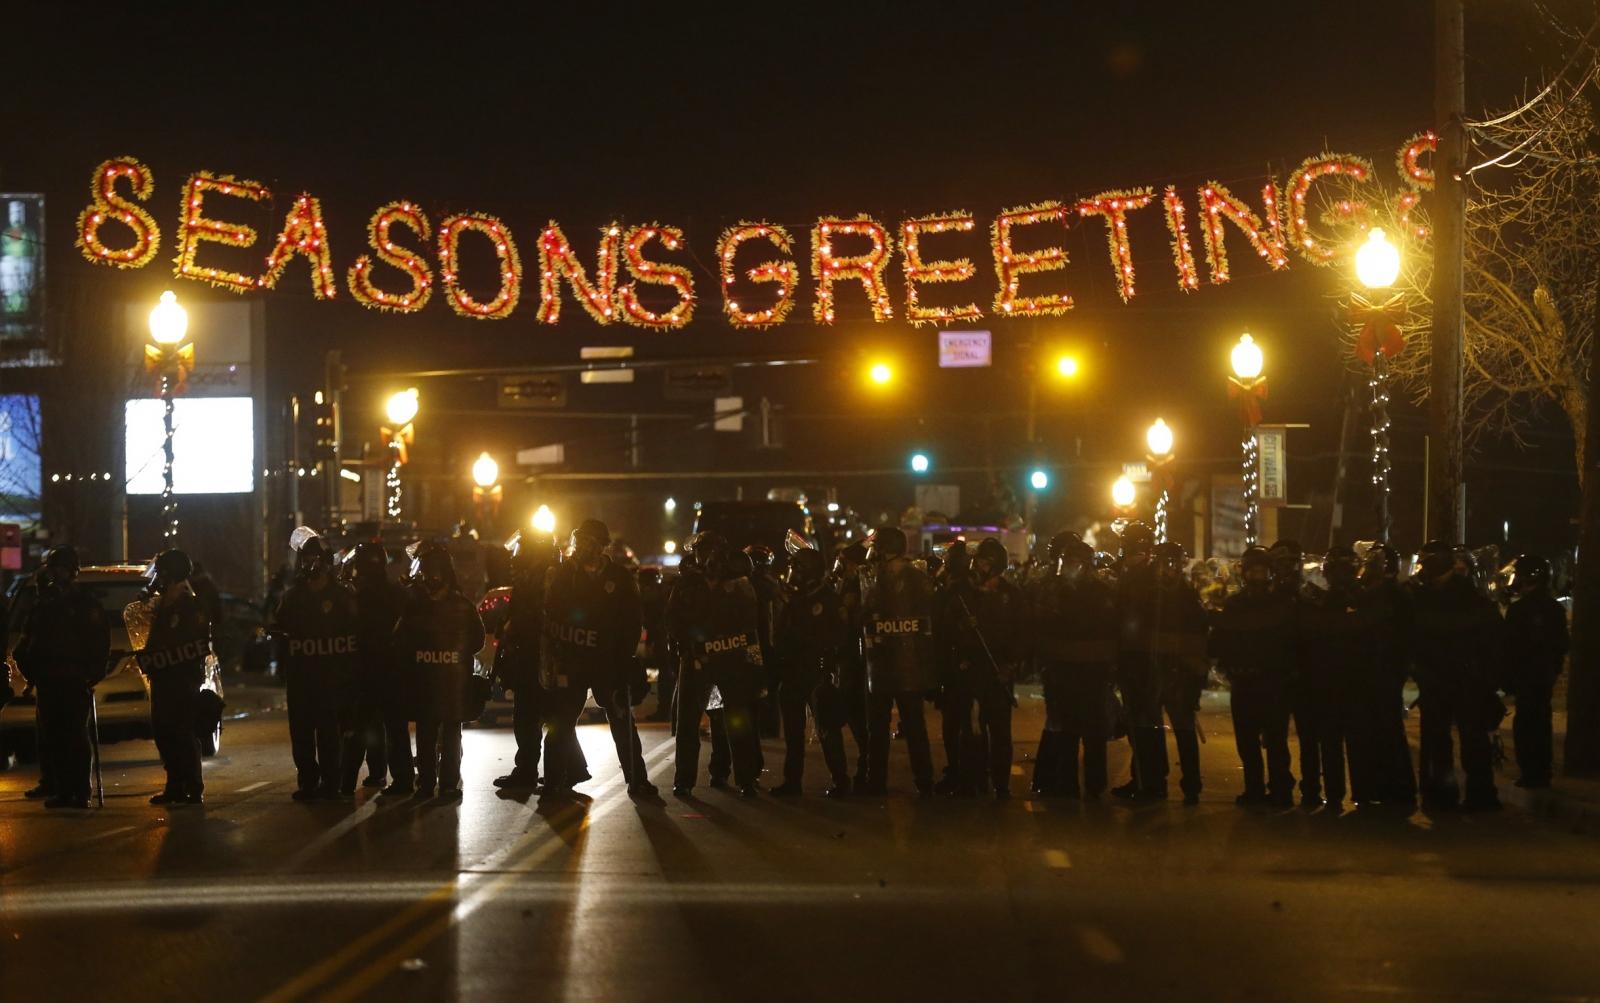 Ferguson Protestors Gather Following Grand Jury Decision Not to Indict Darren Wilson